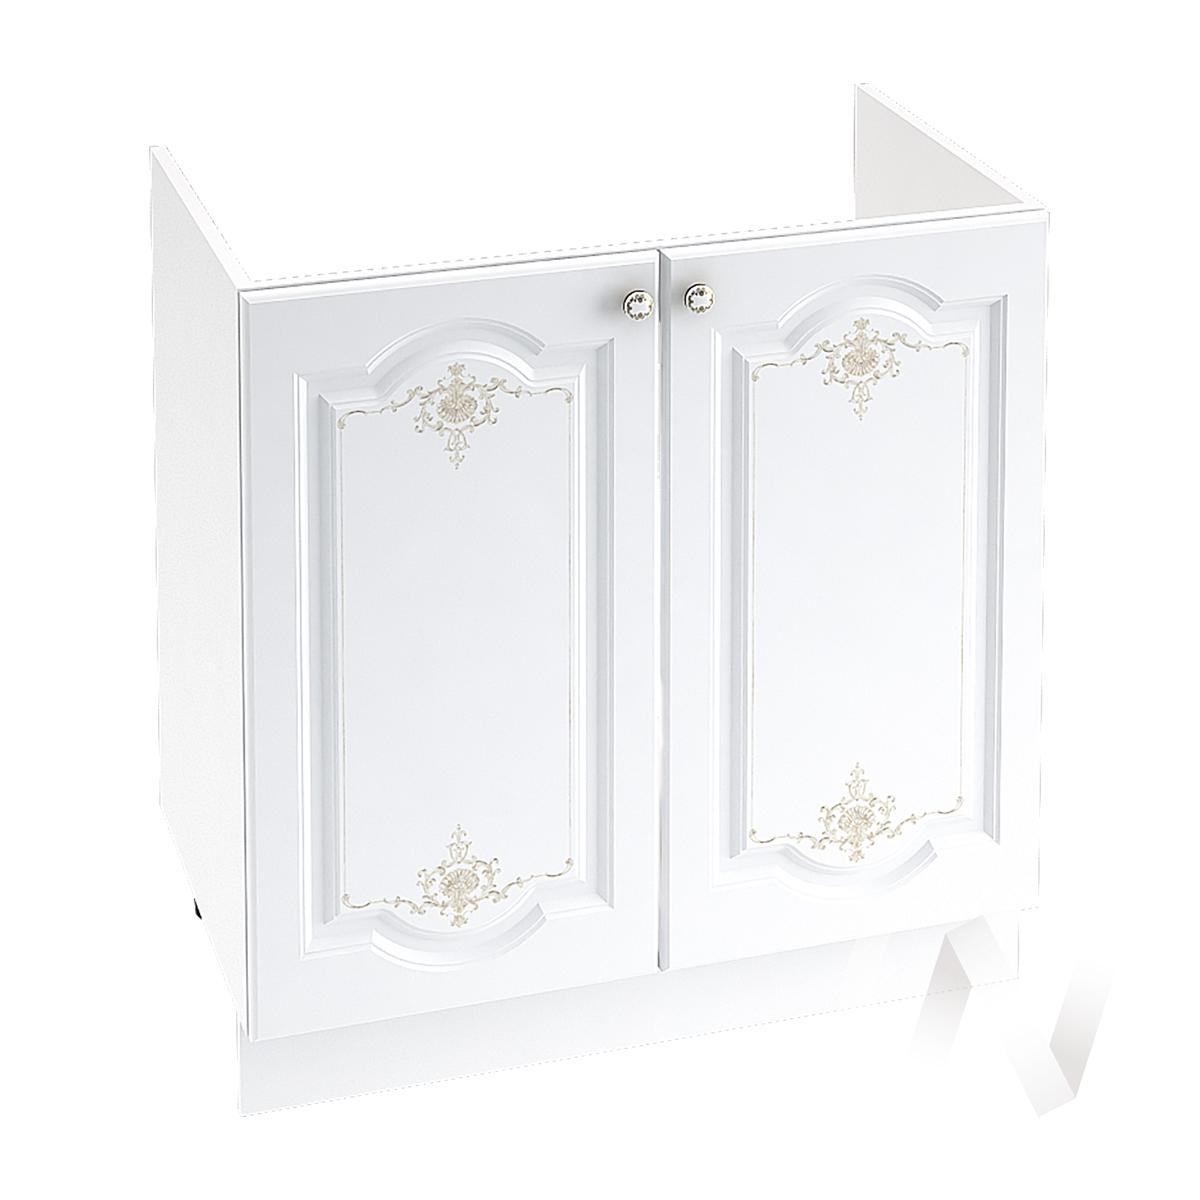 "Кухня ""Шарлиз"": Шкаф нижний под мойку 800, ШНМ 800 (корпус белый)"